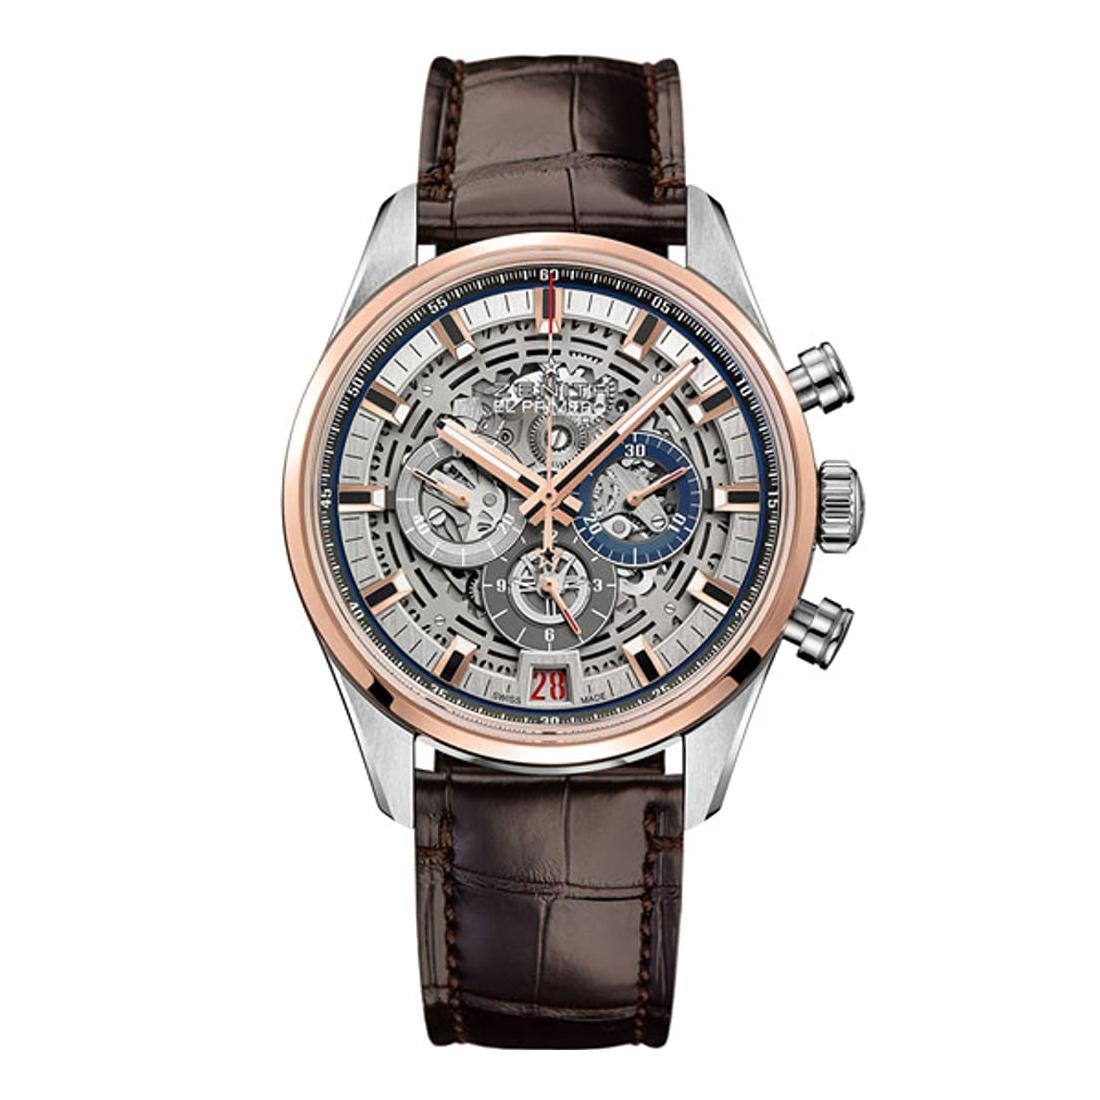 Reloj Zenith – El Primero Full Open - Amaya Joyeros